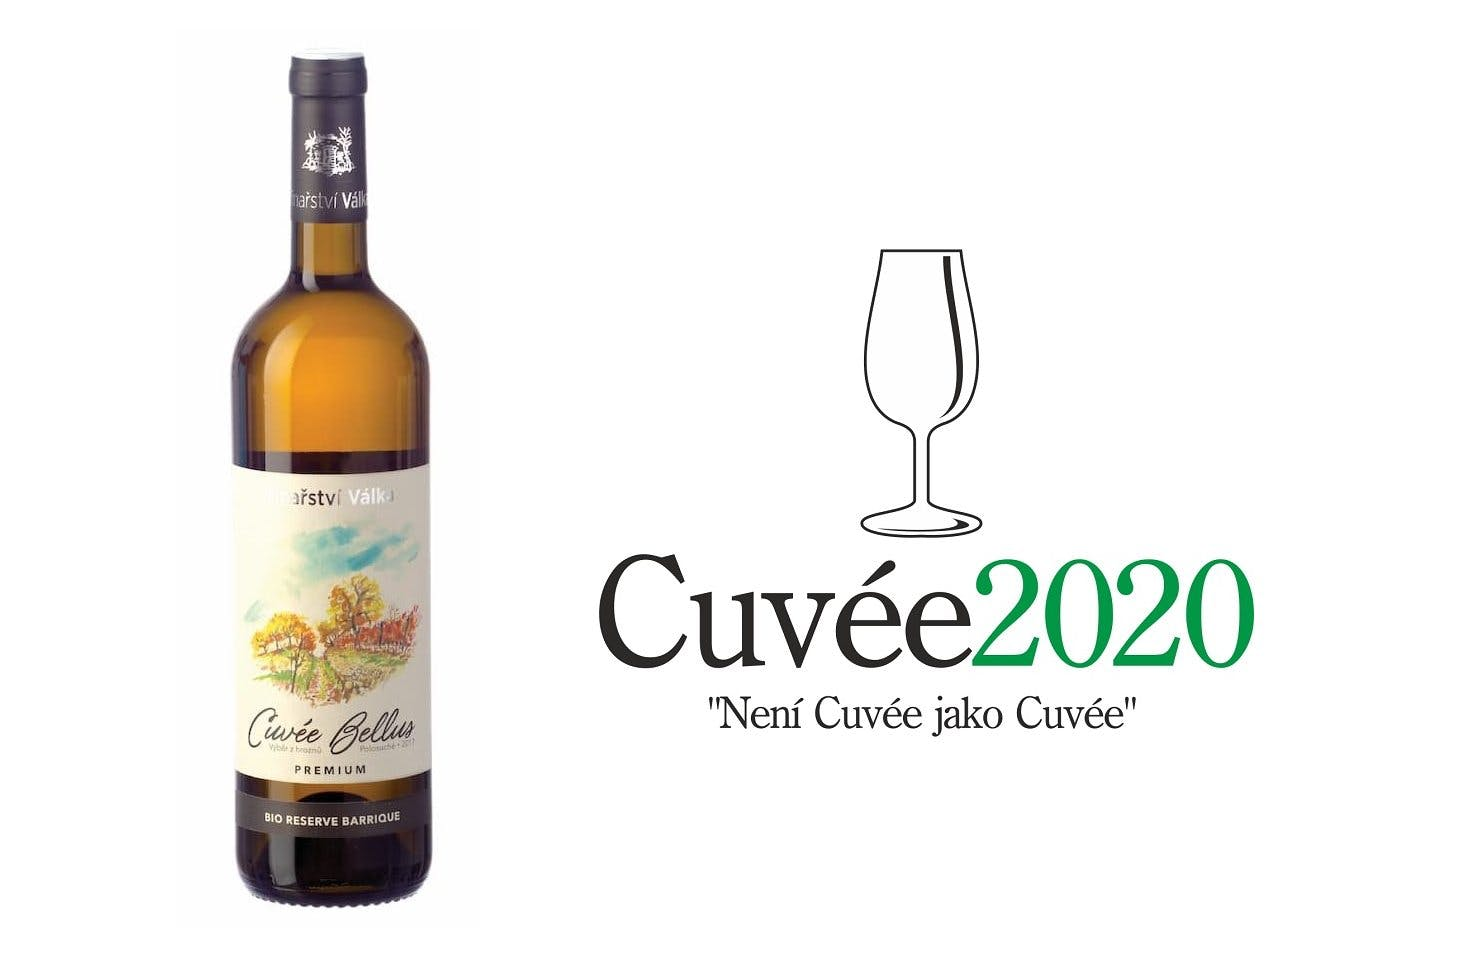 Cuvee 2020